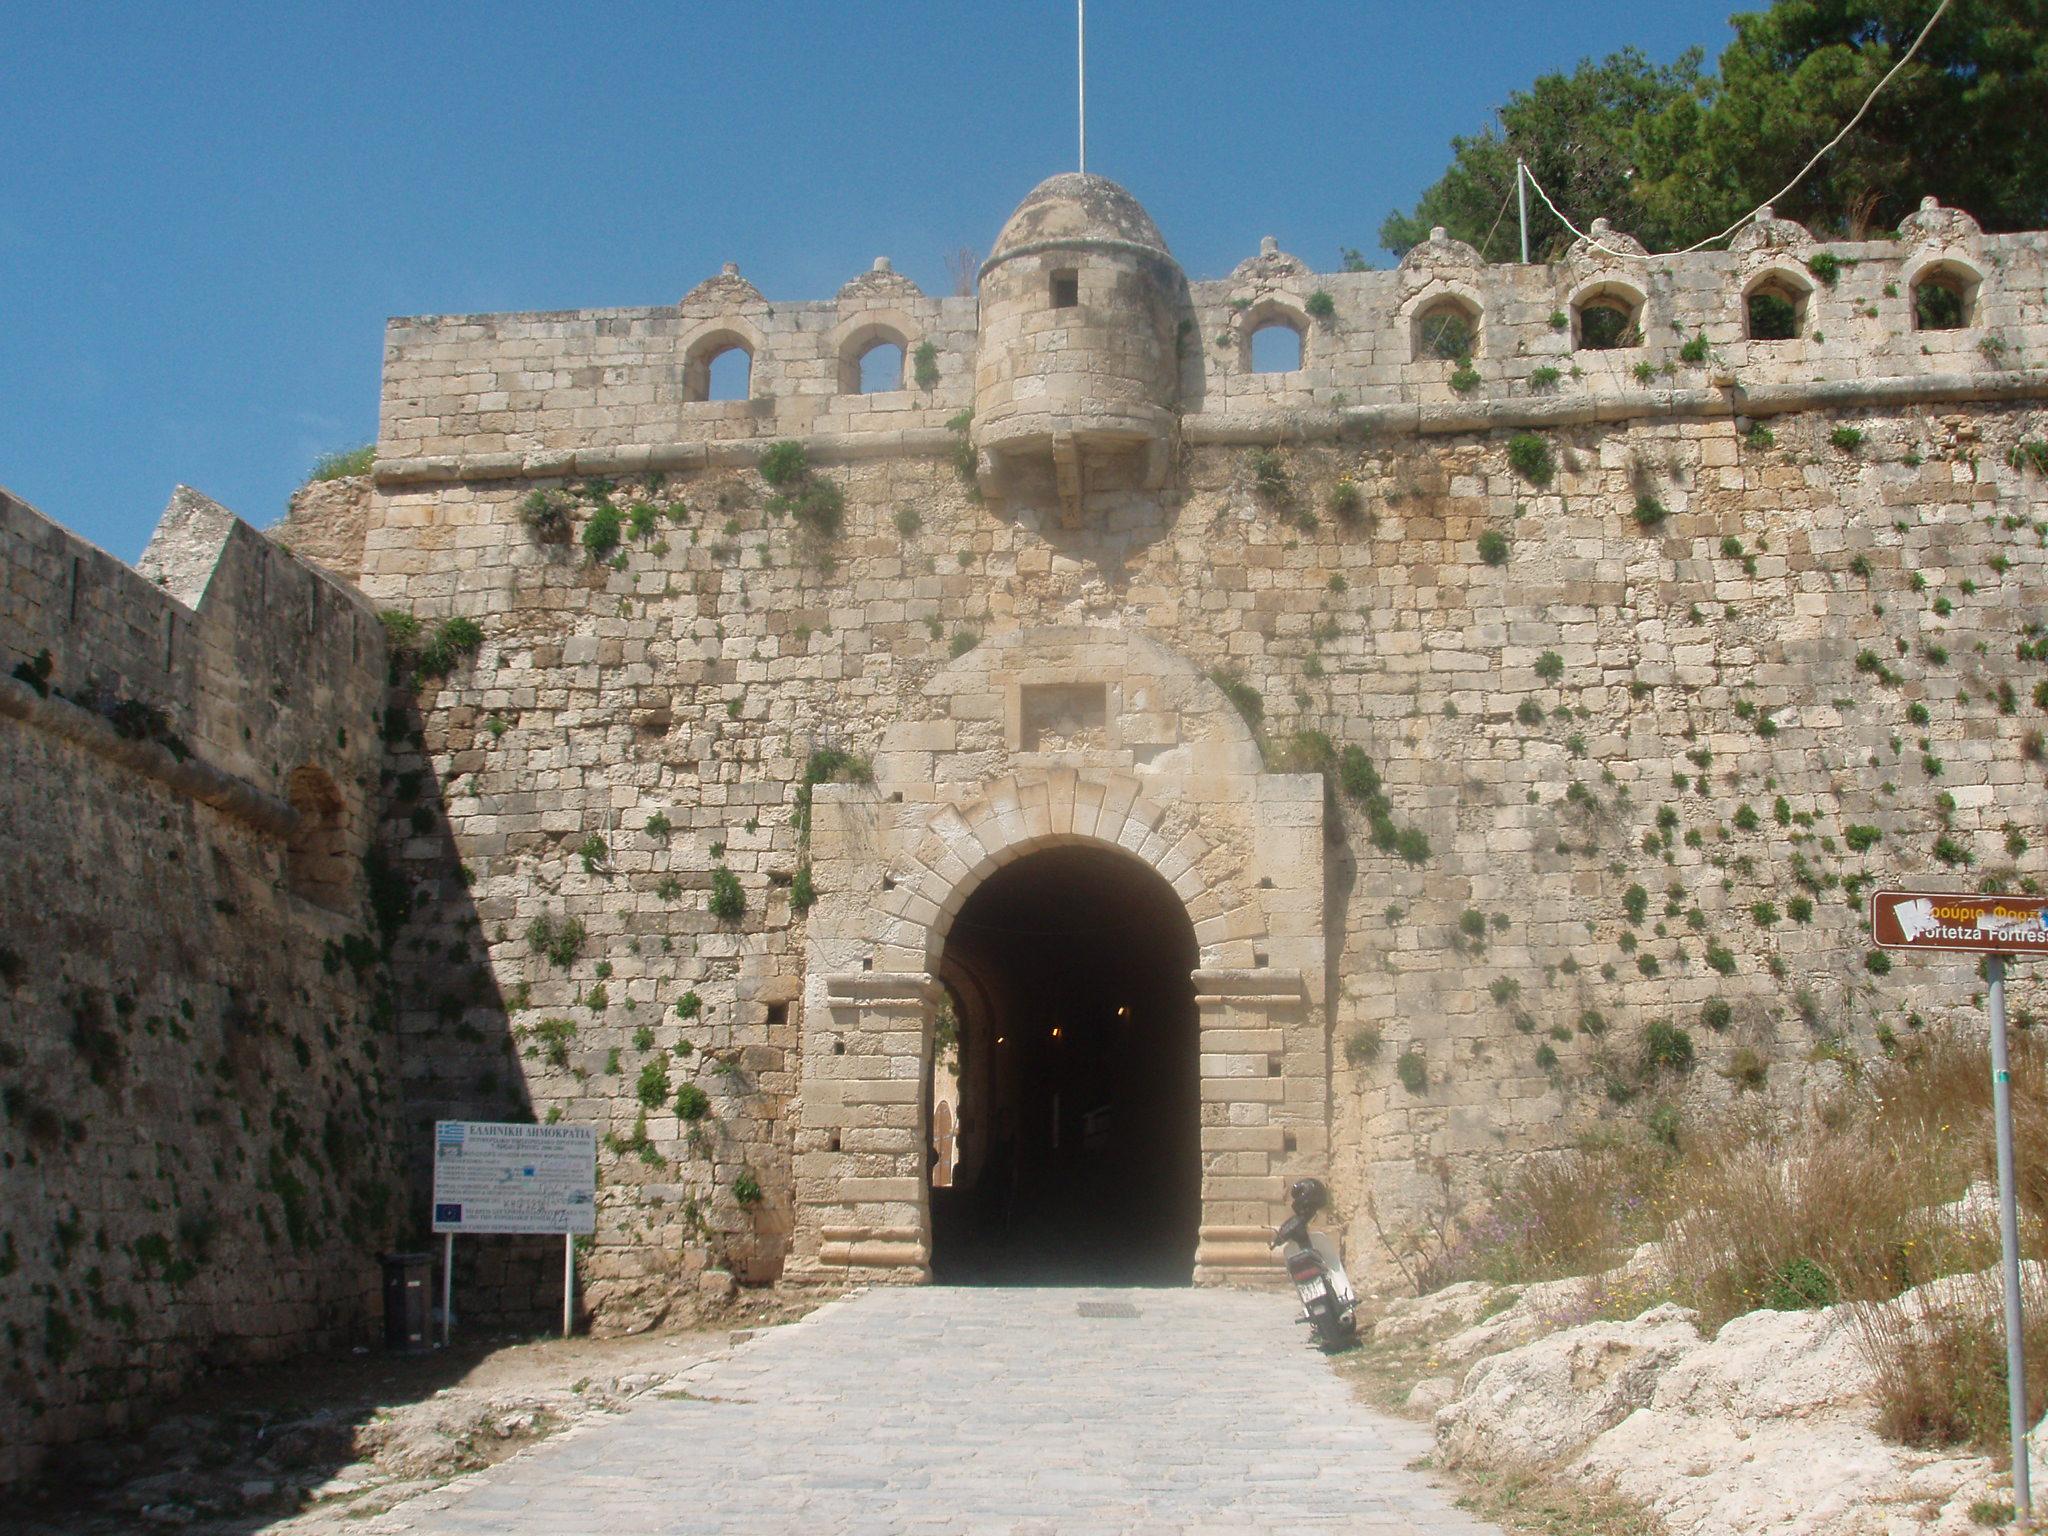 File:Rethymno Fortezza gate.jpg